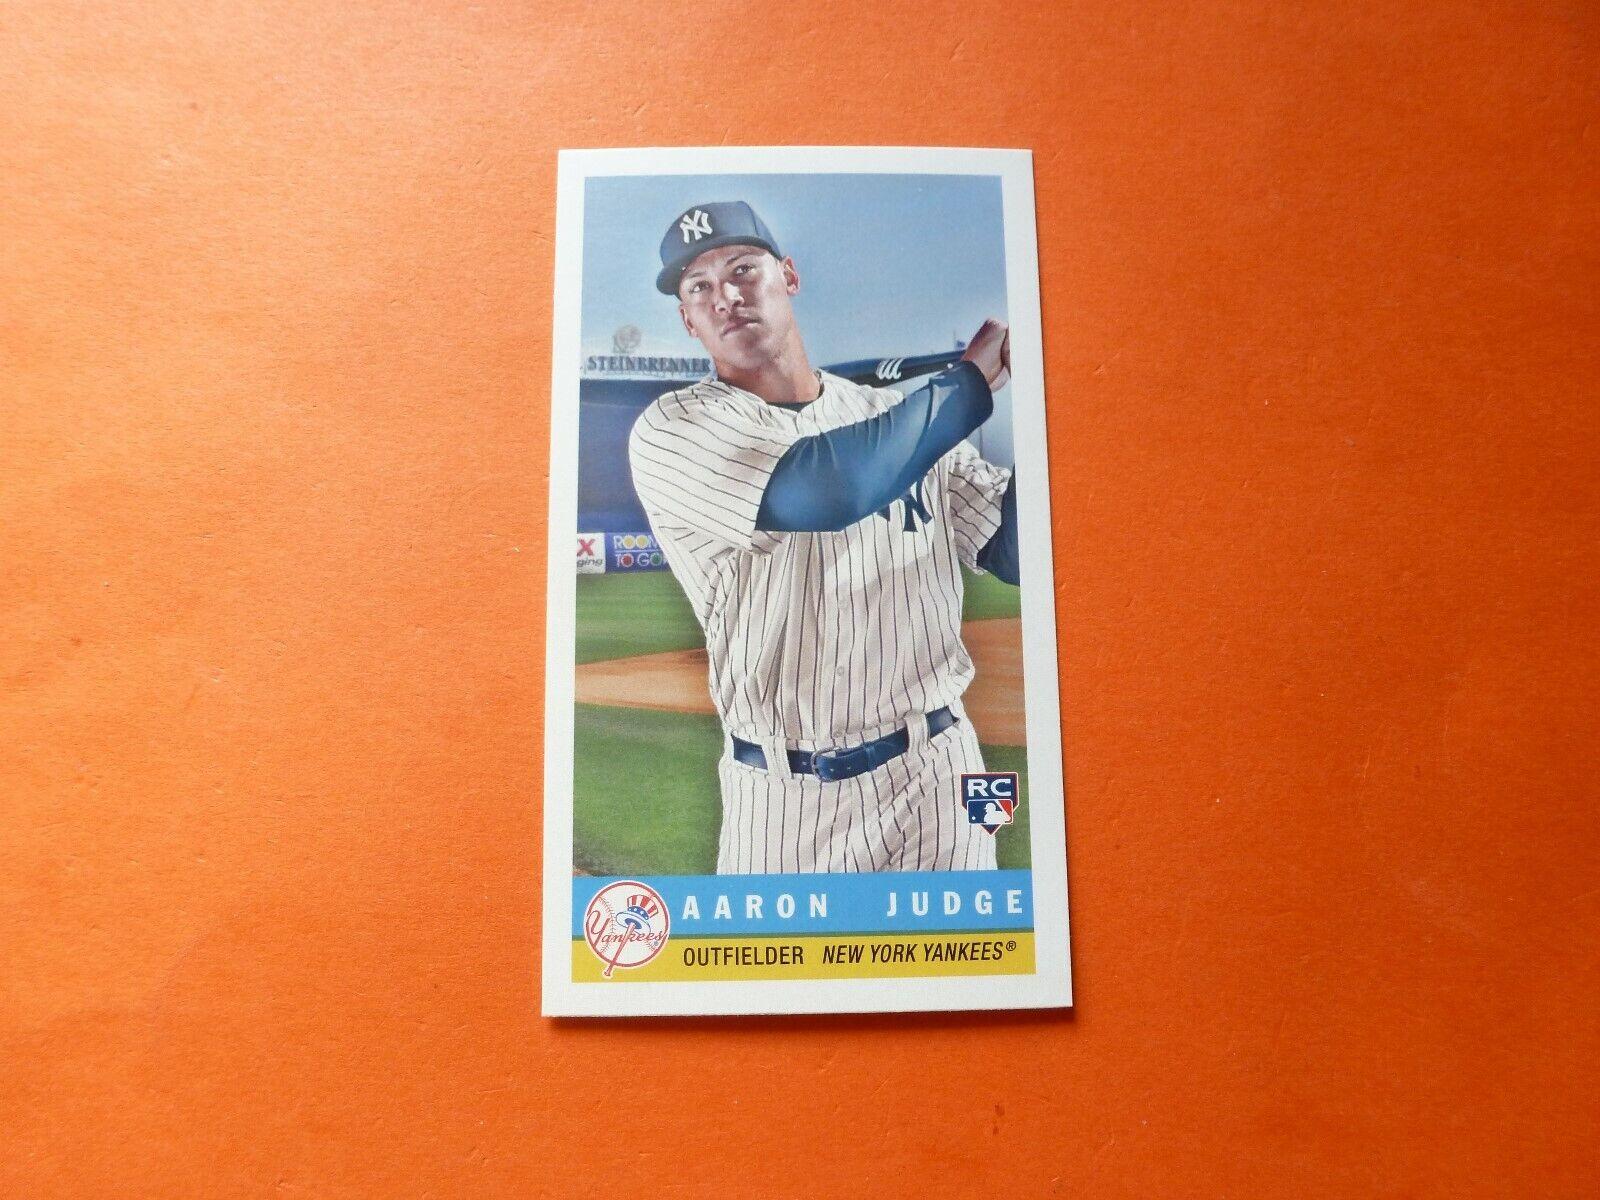 Aaron Judge RC, 2017 Topps Archives 1959 Bazooka Mini, 59B-7, New York Yankees